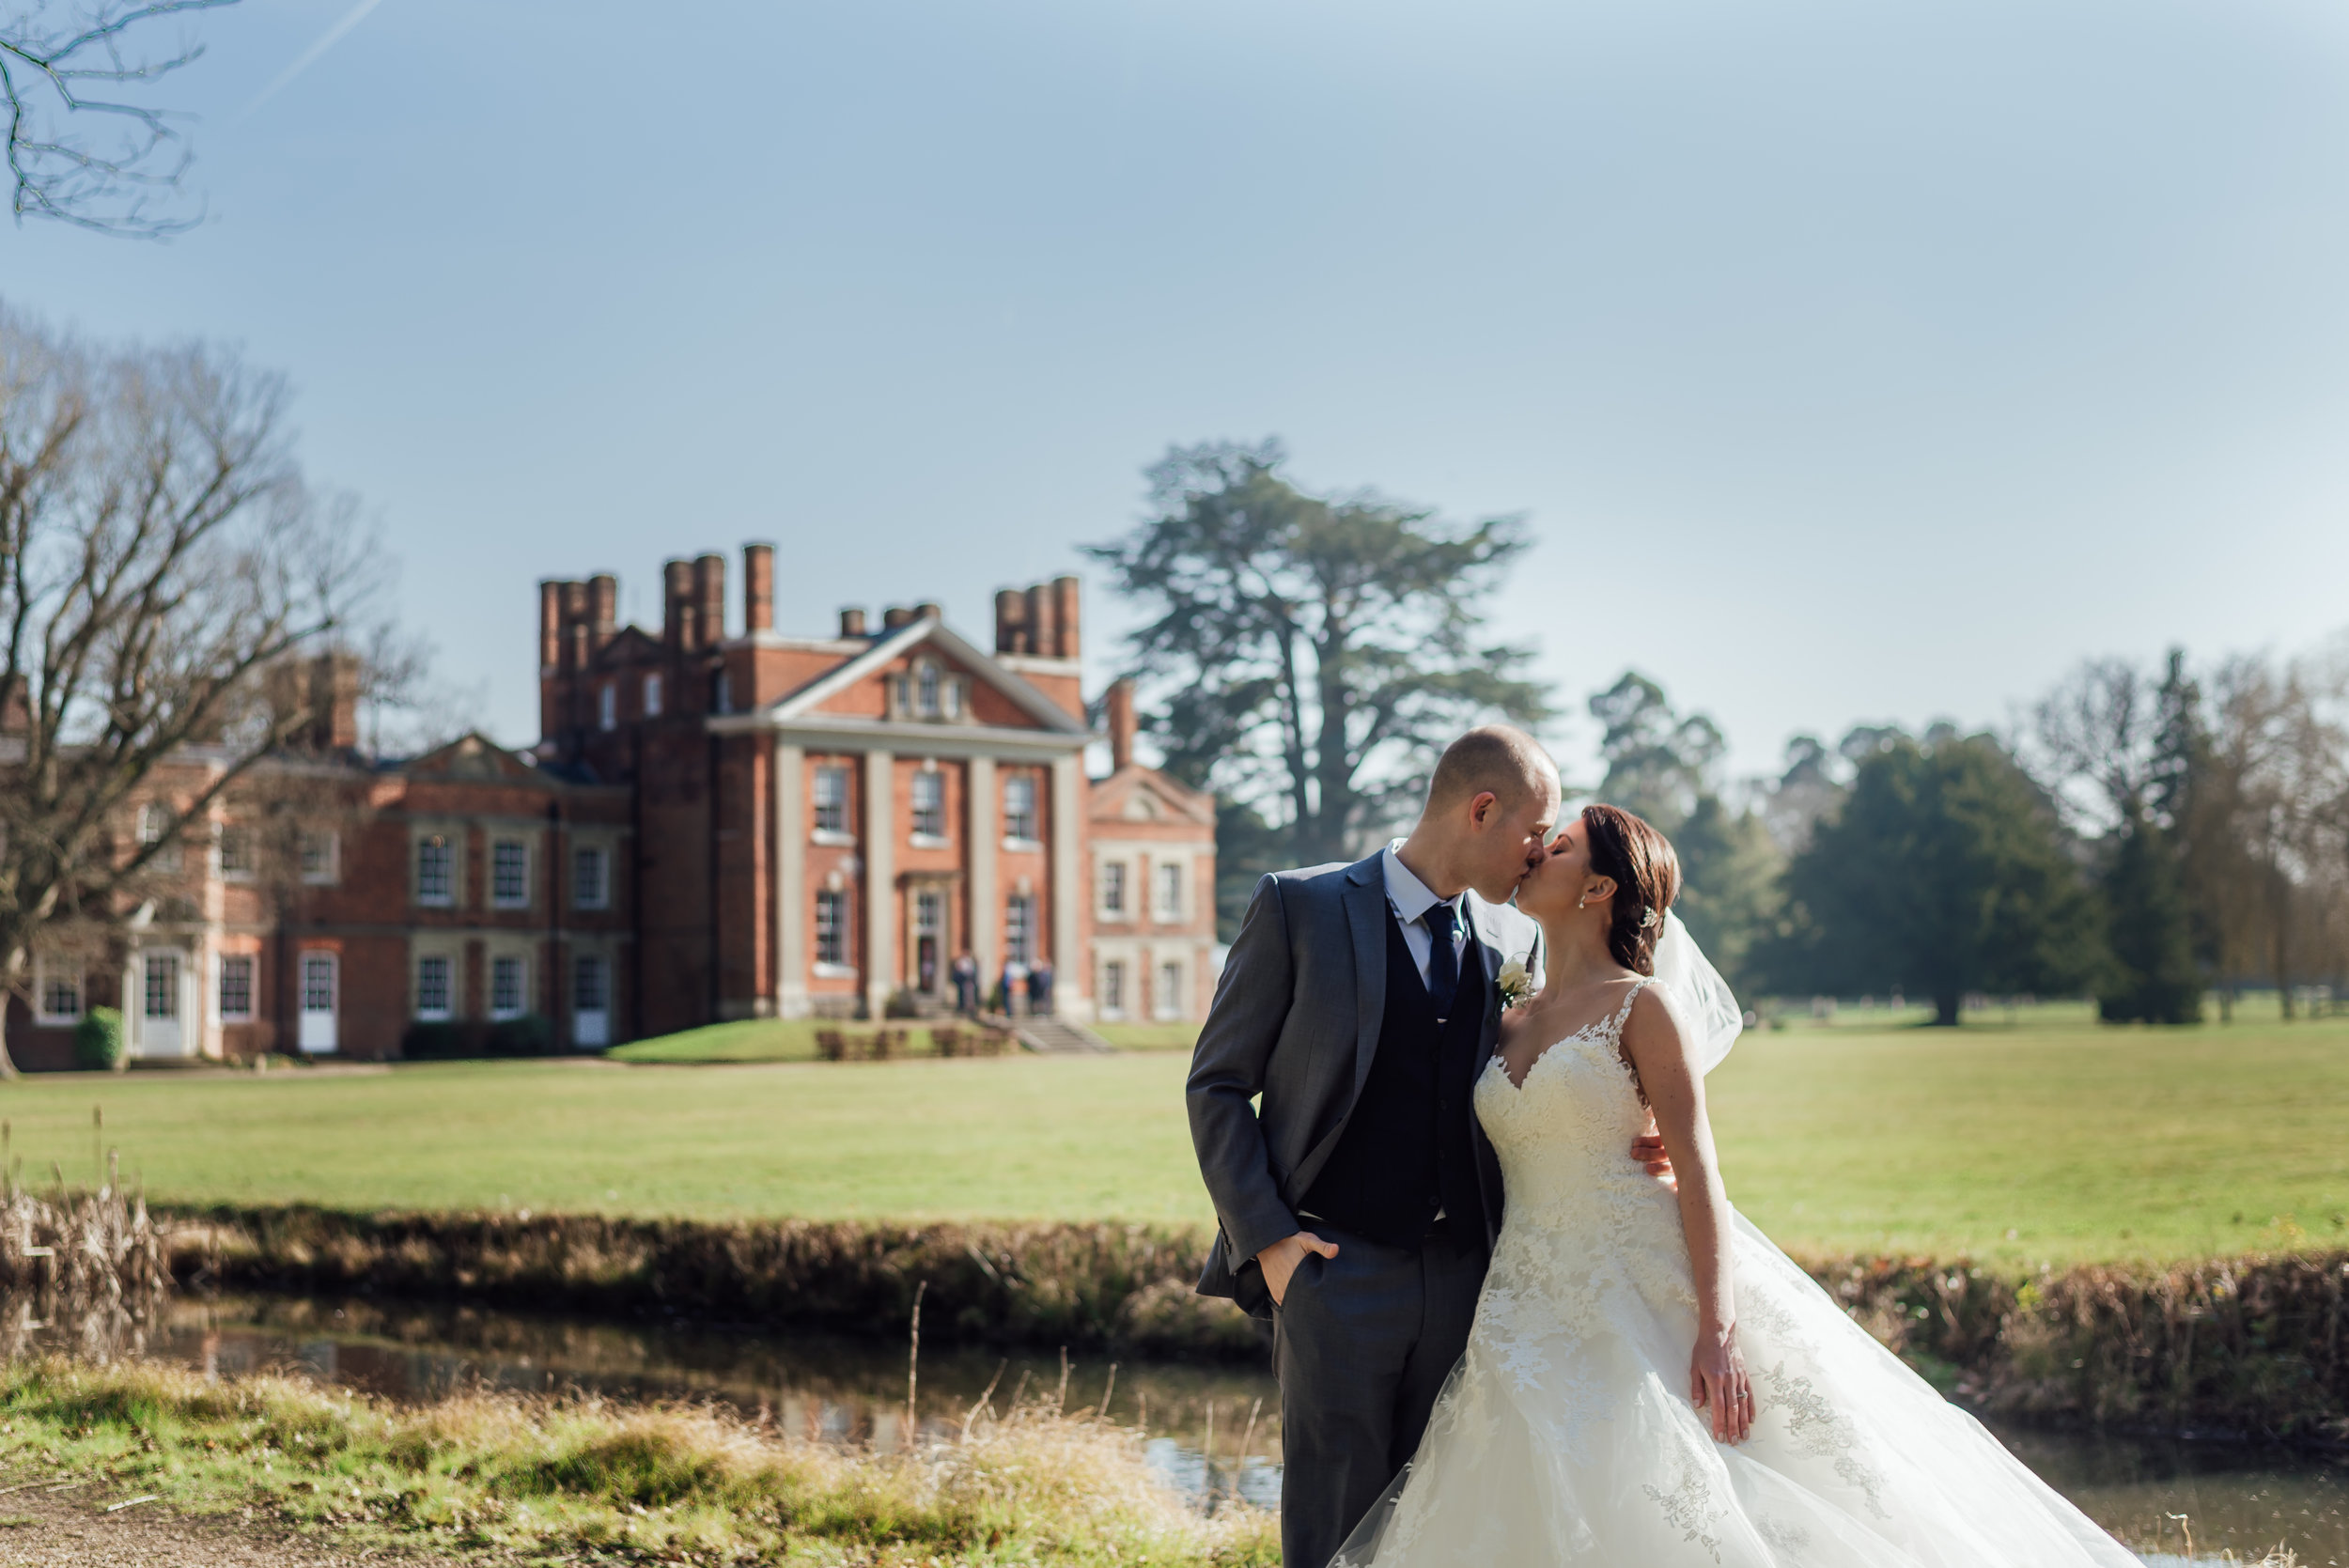 Sarah-Fishlock-Photography-Hampshire-wedding-photographer : fleet-wedding-photographer-fleet : warbrook-house-wedding-venue : warbrook-house-wedding-photographer : hampshire-wedding-venue : hampshire-stately-home-wedding-venue / Warbrook-House